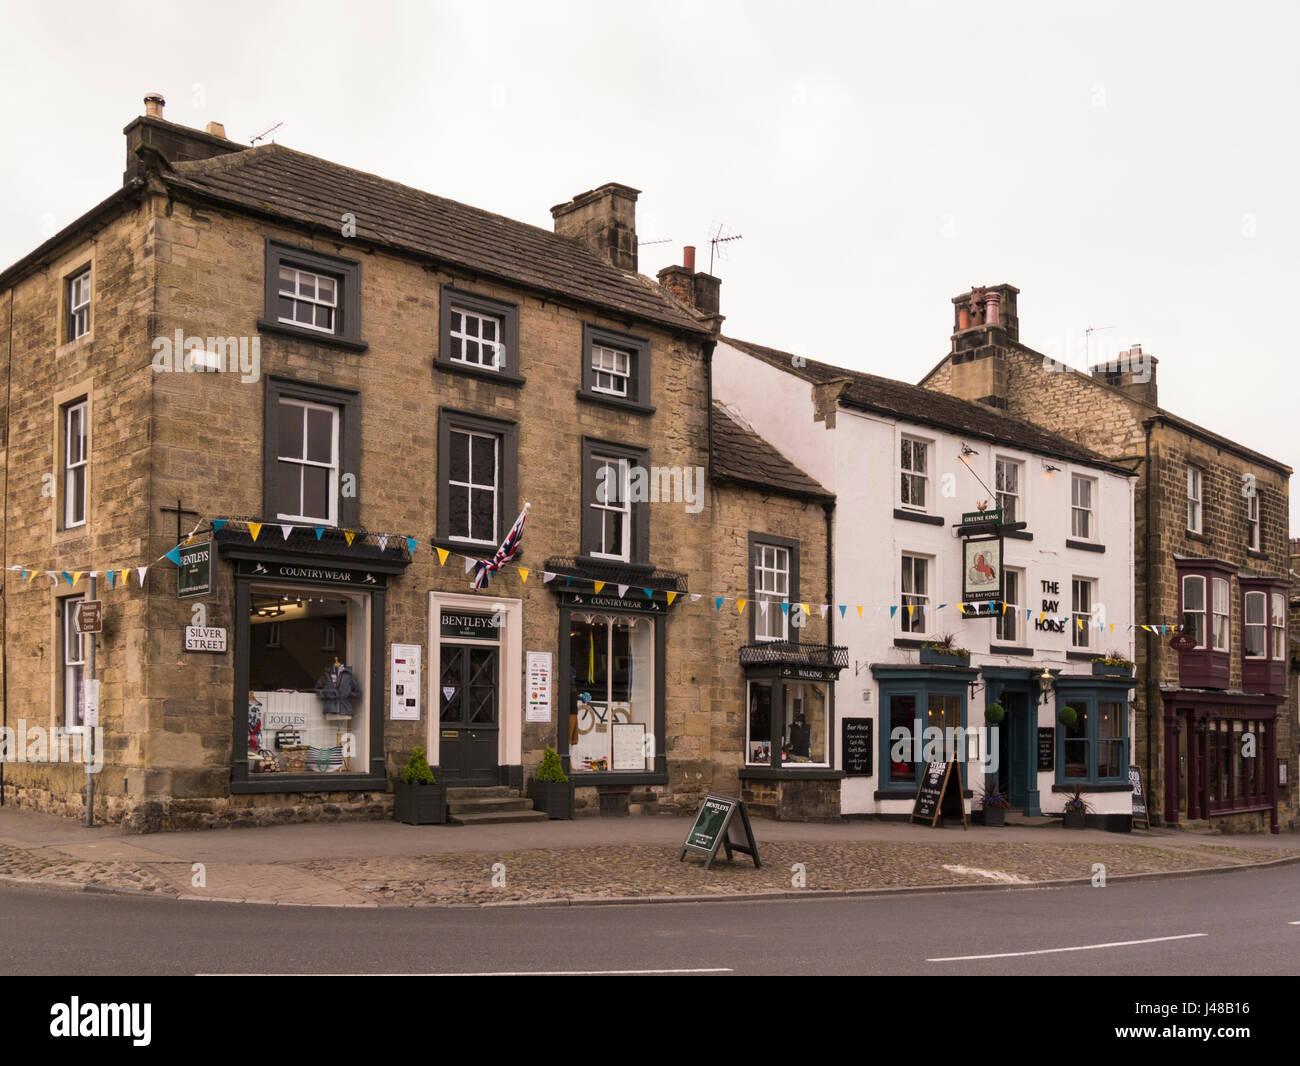 Silver Street vibrant and friendly market town Masham Lower Wensleydale North Yorkshire England UK - Stock Image